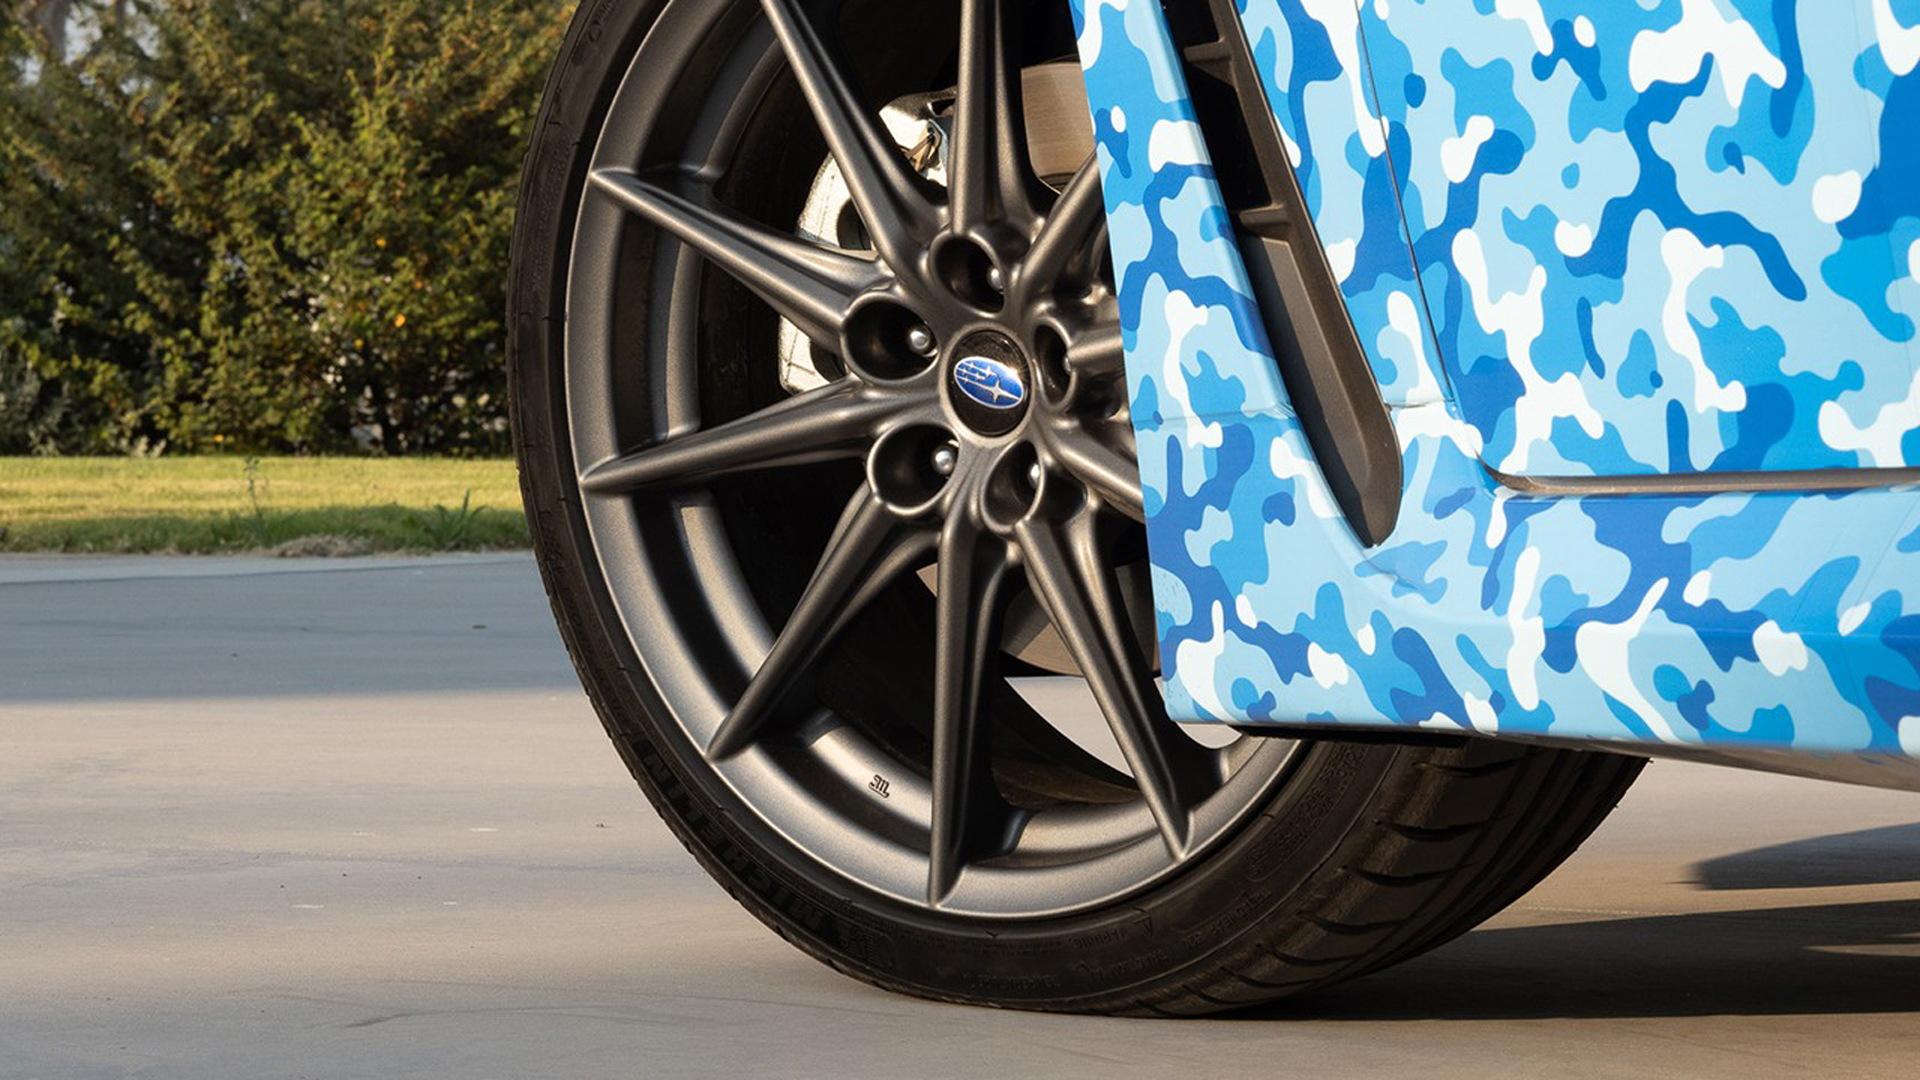 Teaser for 2022 Subaru BRZ debuting on November 18, 2020